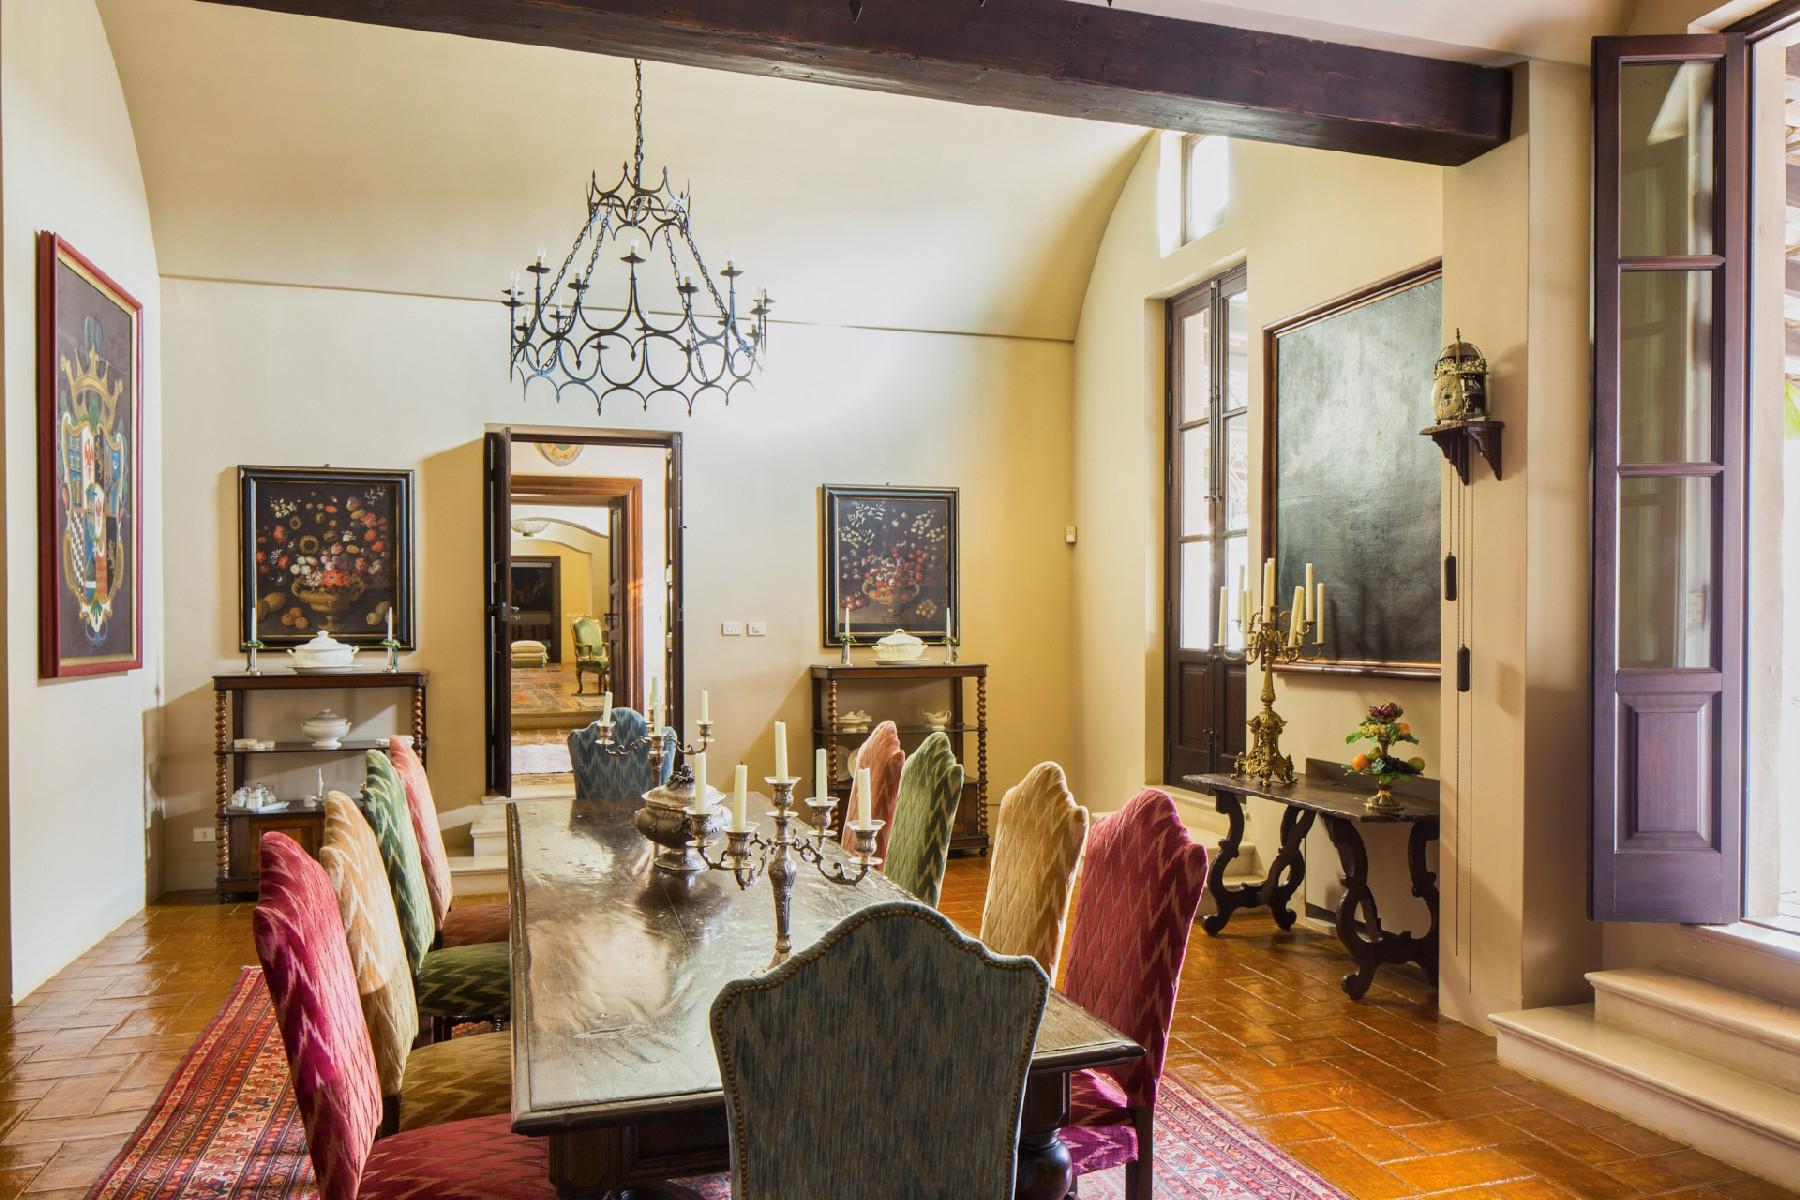 Villa in Vendita a Tricase: 5 locali, 1700 mq - Foto 8